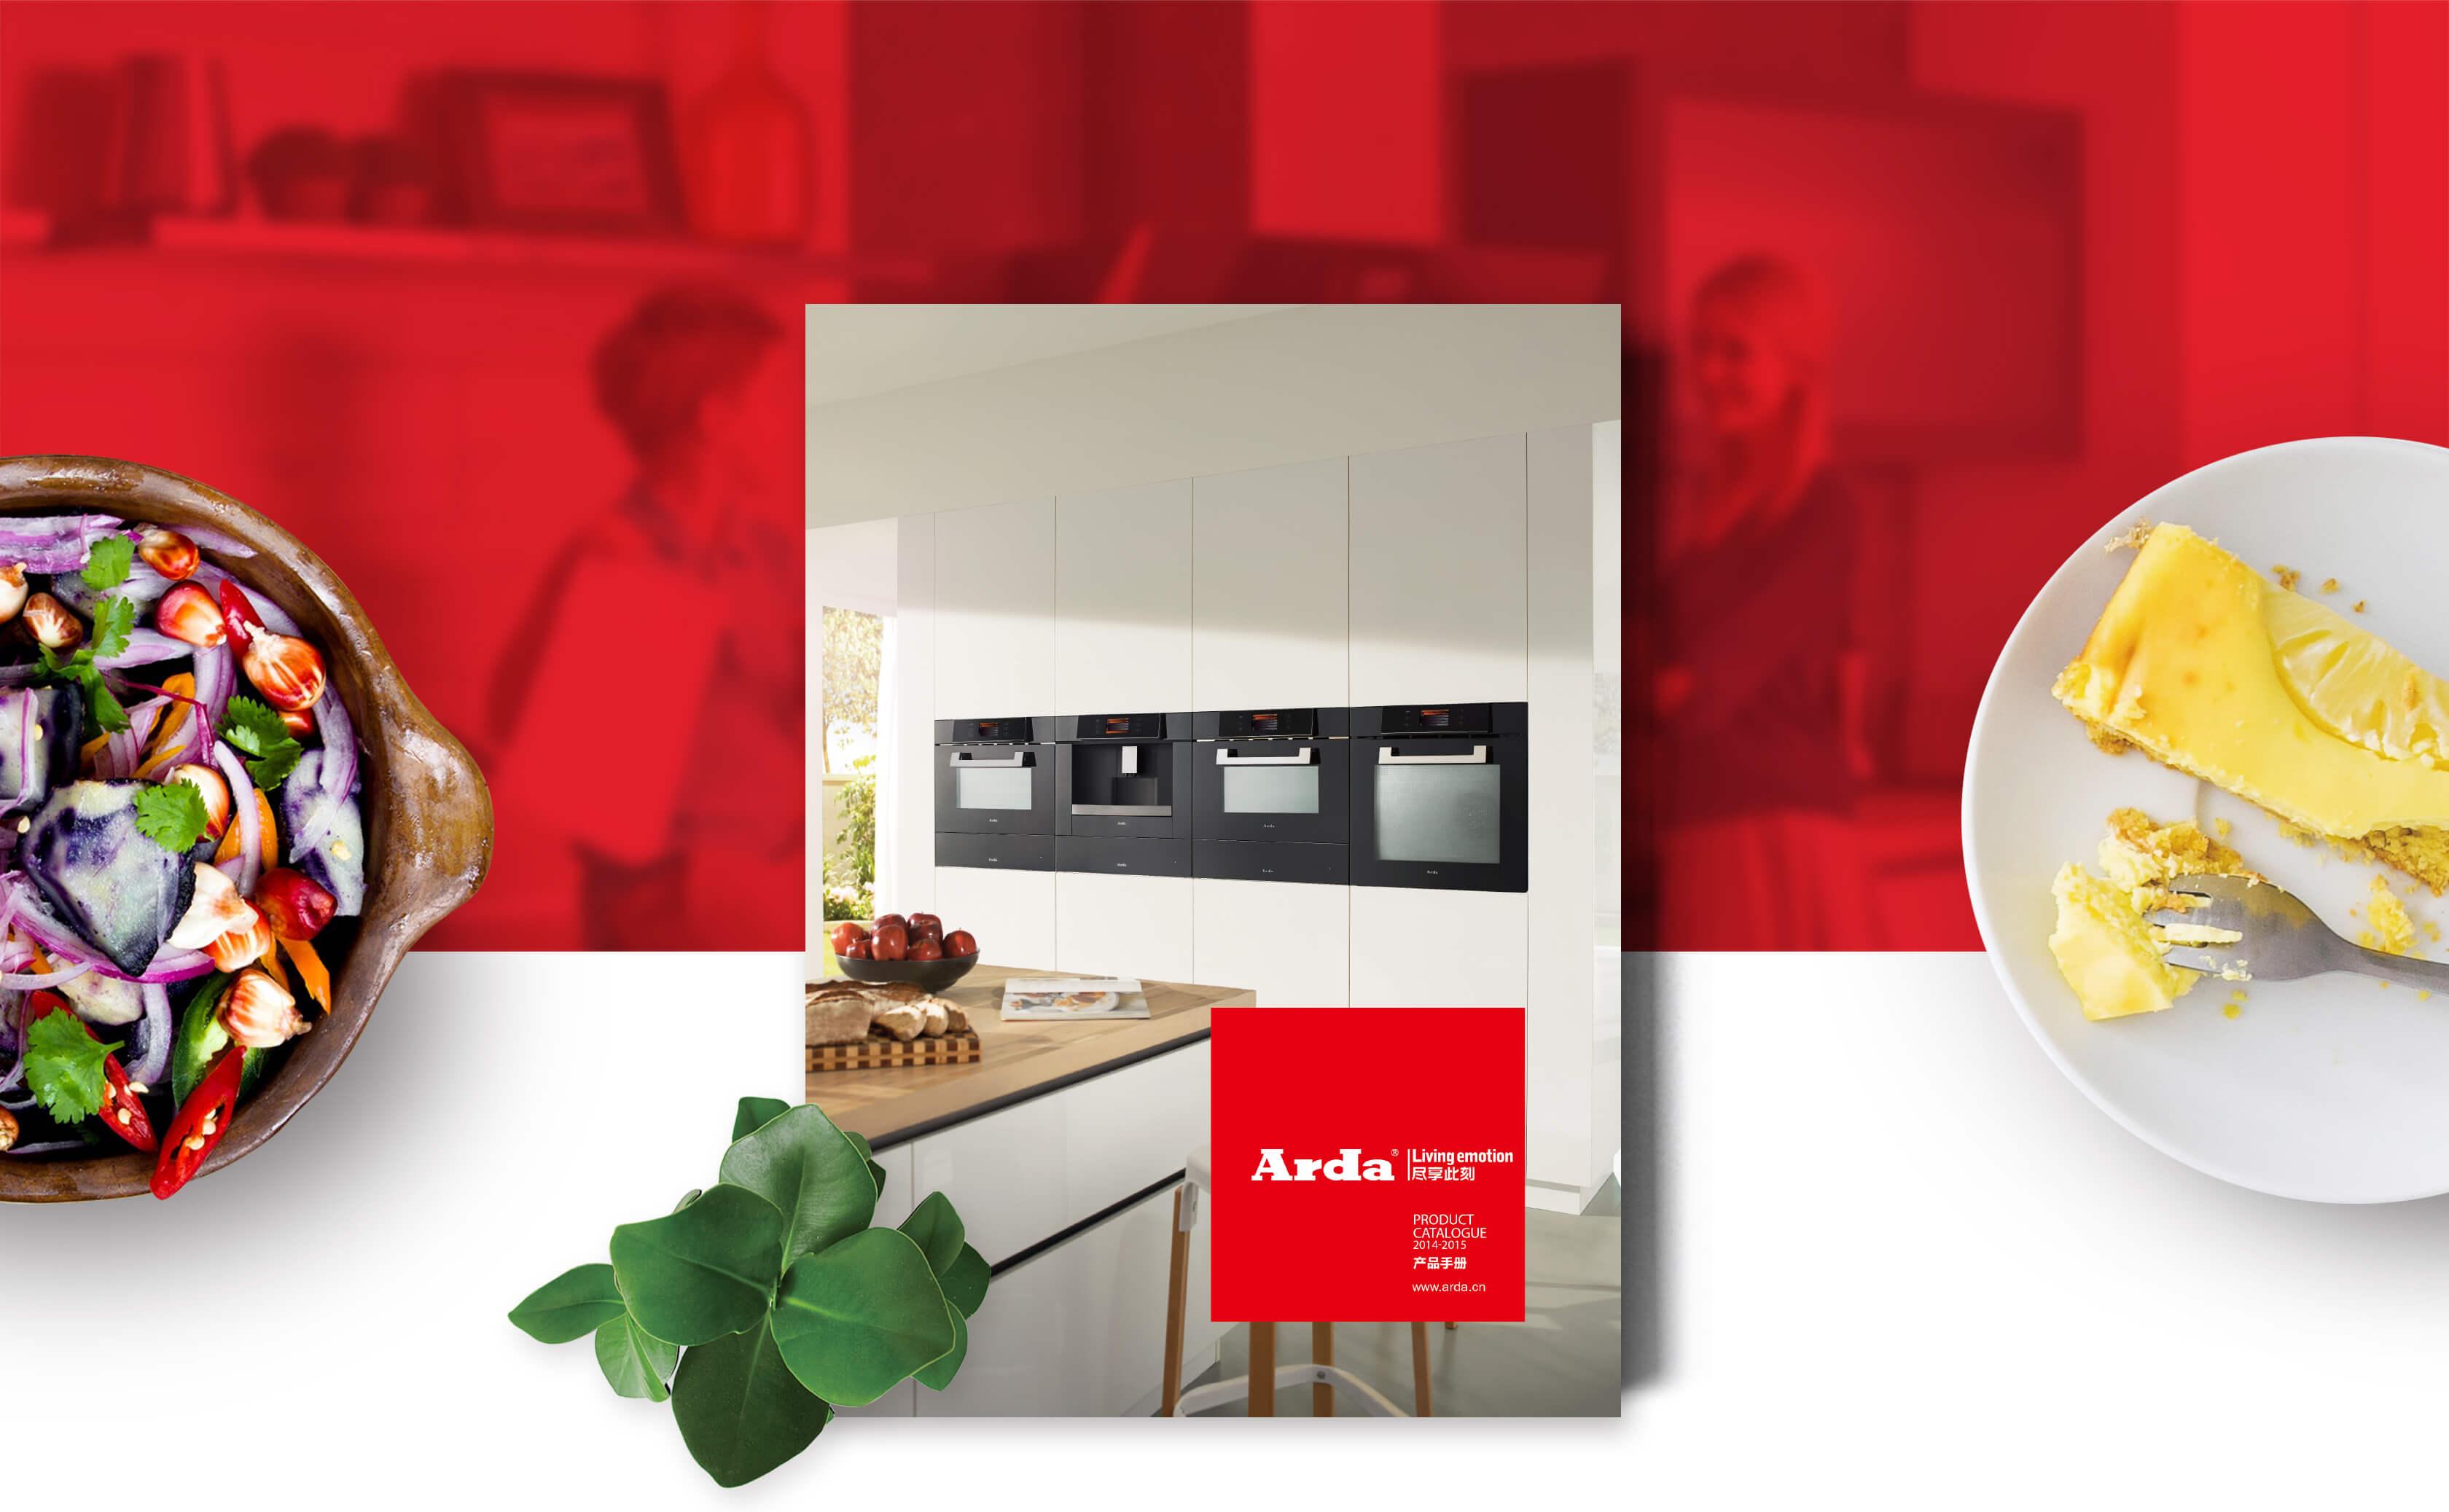 Arda品牌画册设计 画册设计 | 班田互动